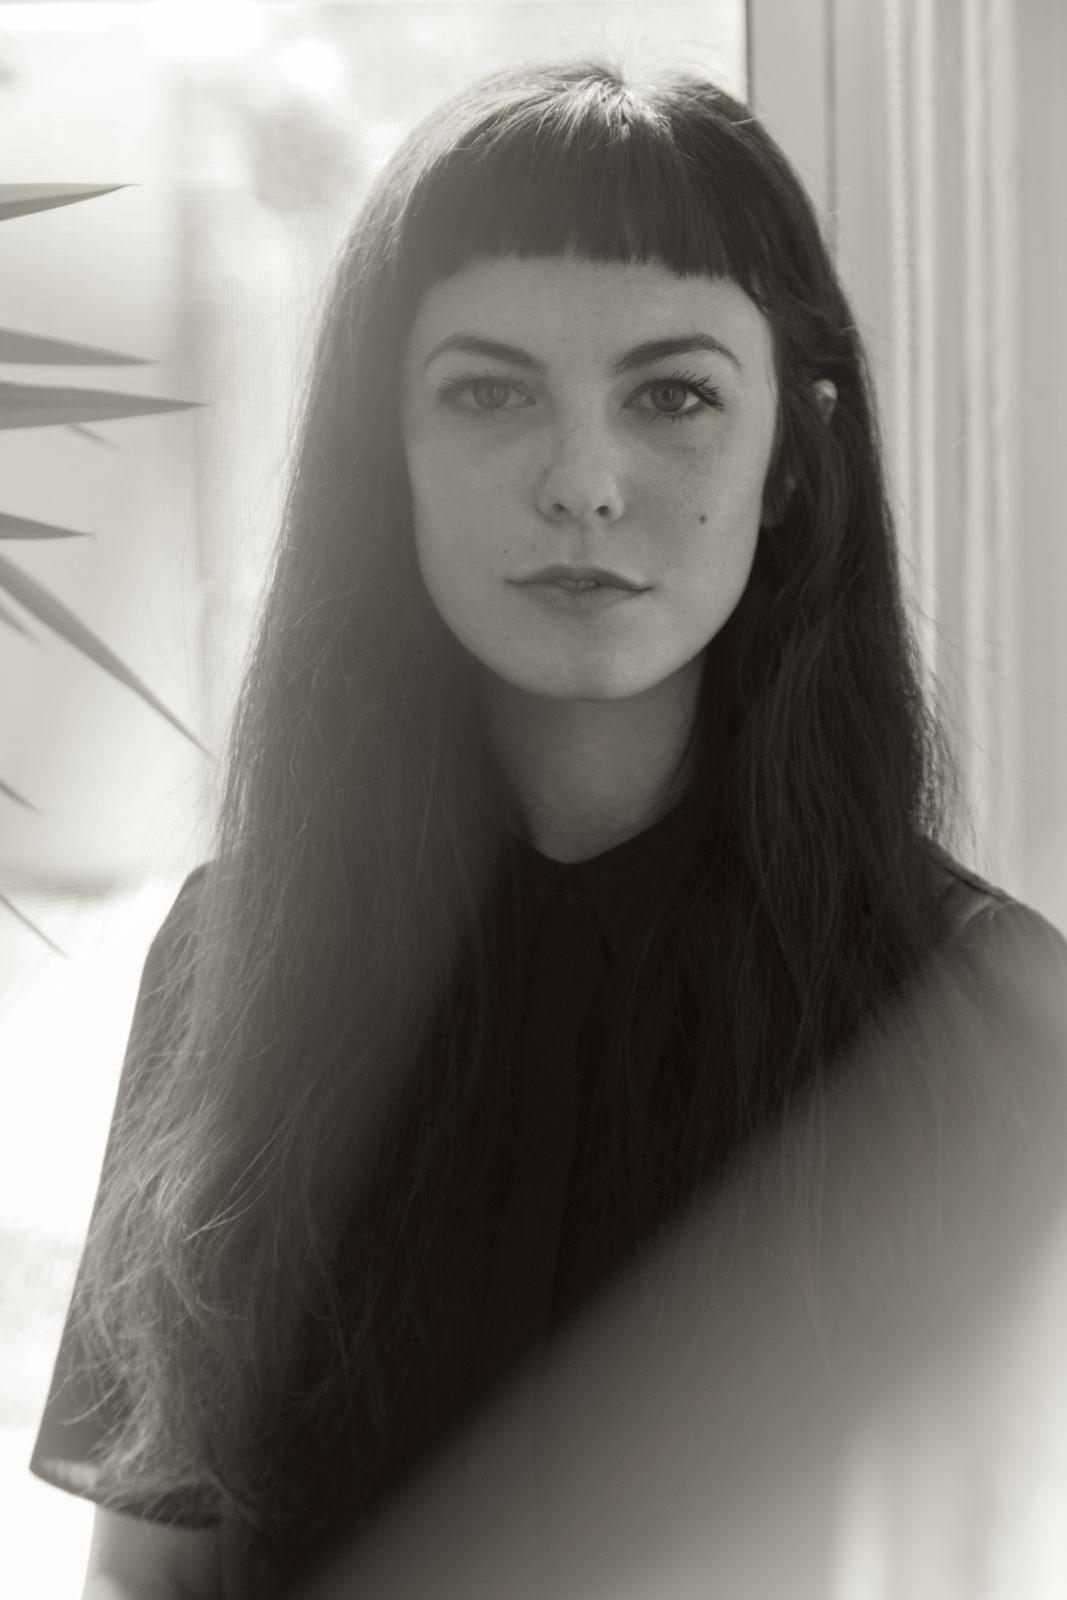 Maggie Millner by Jordan Tibero - Carla Cain-Walther